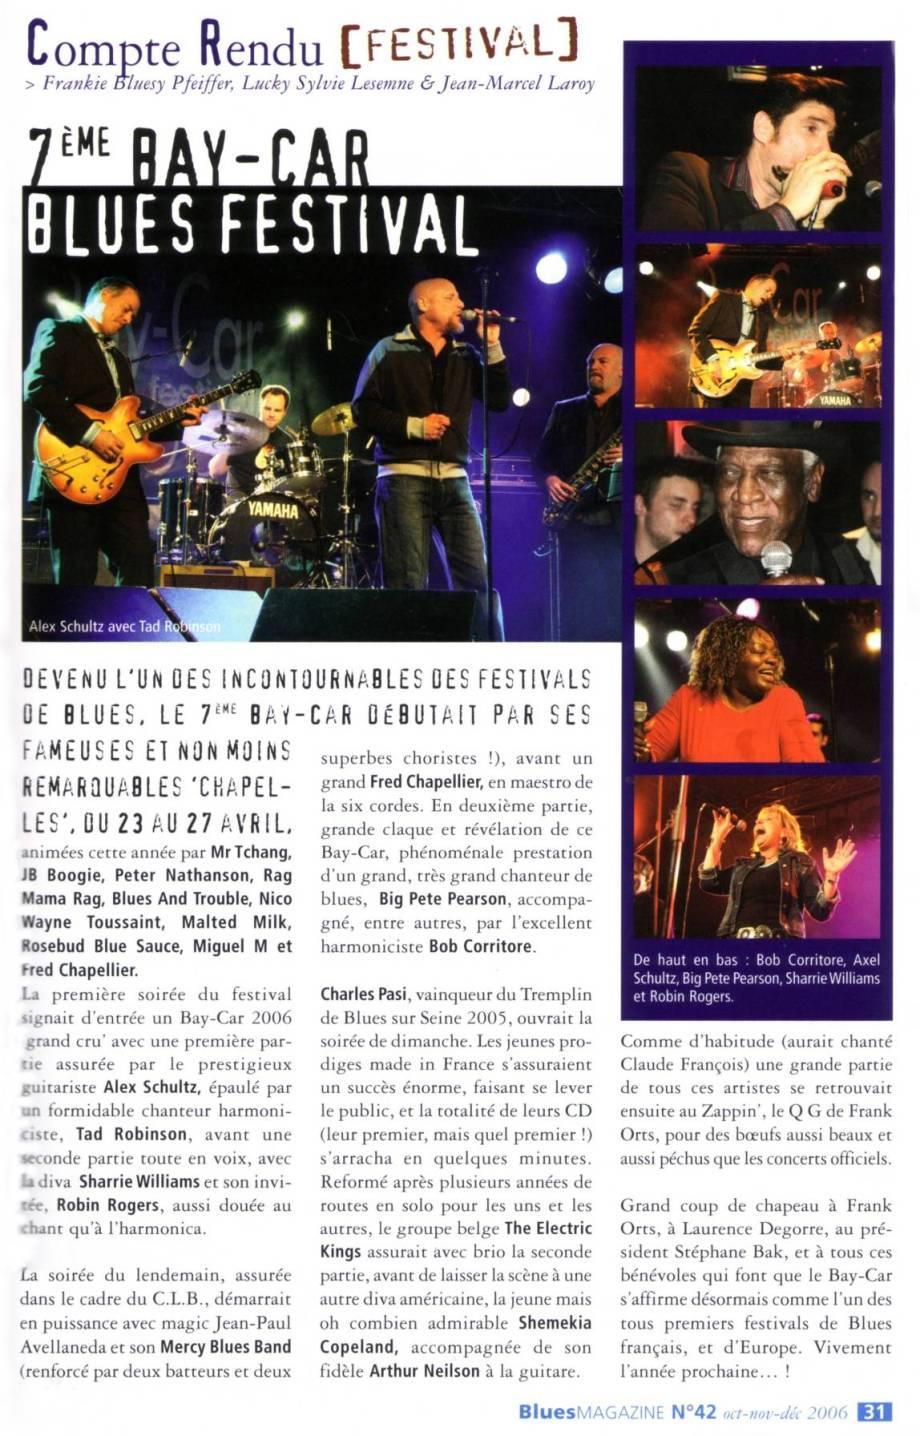 Blues_Mag_42